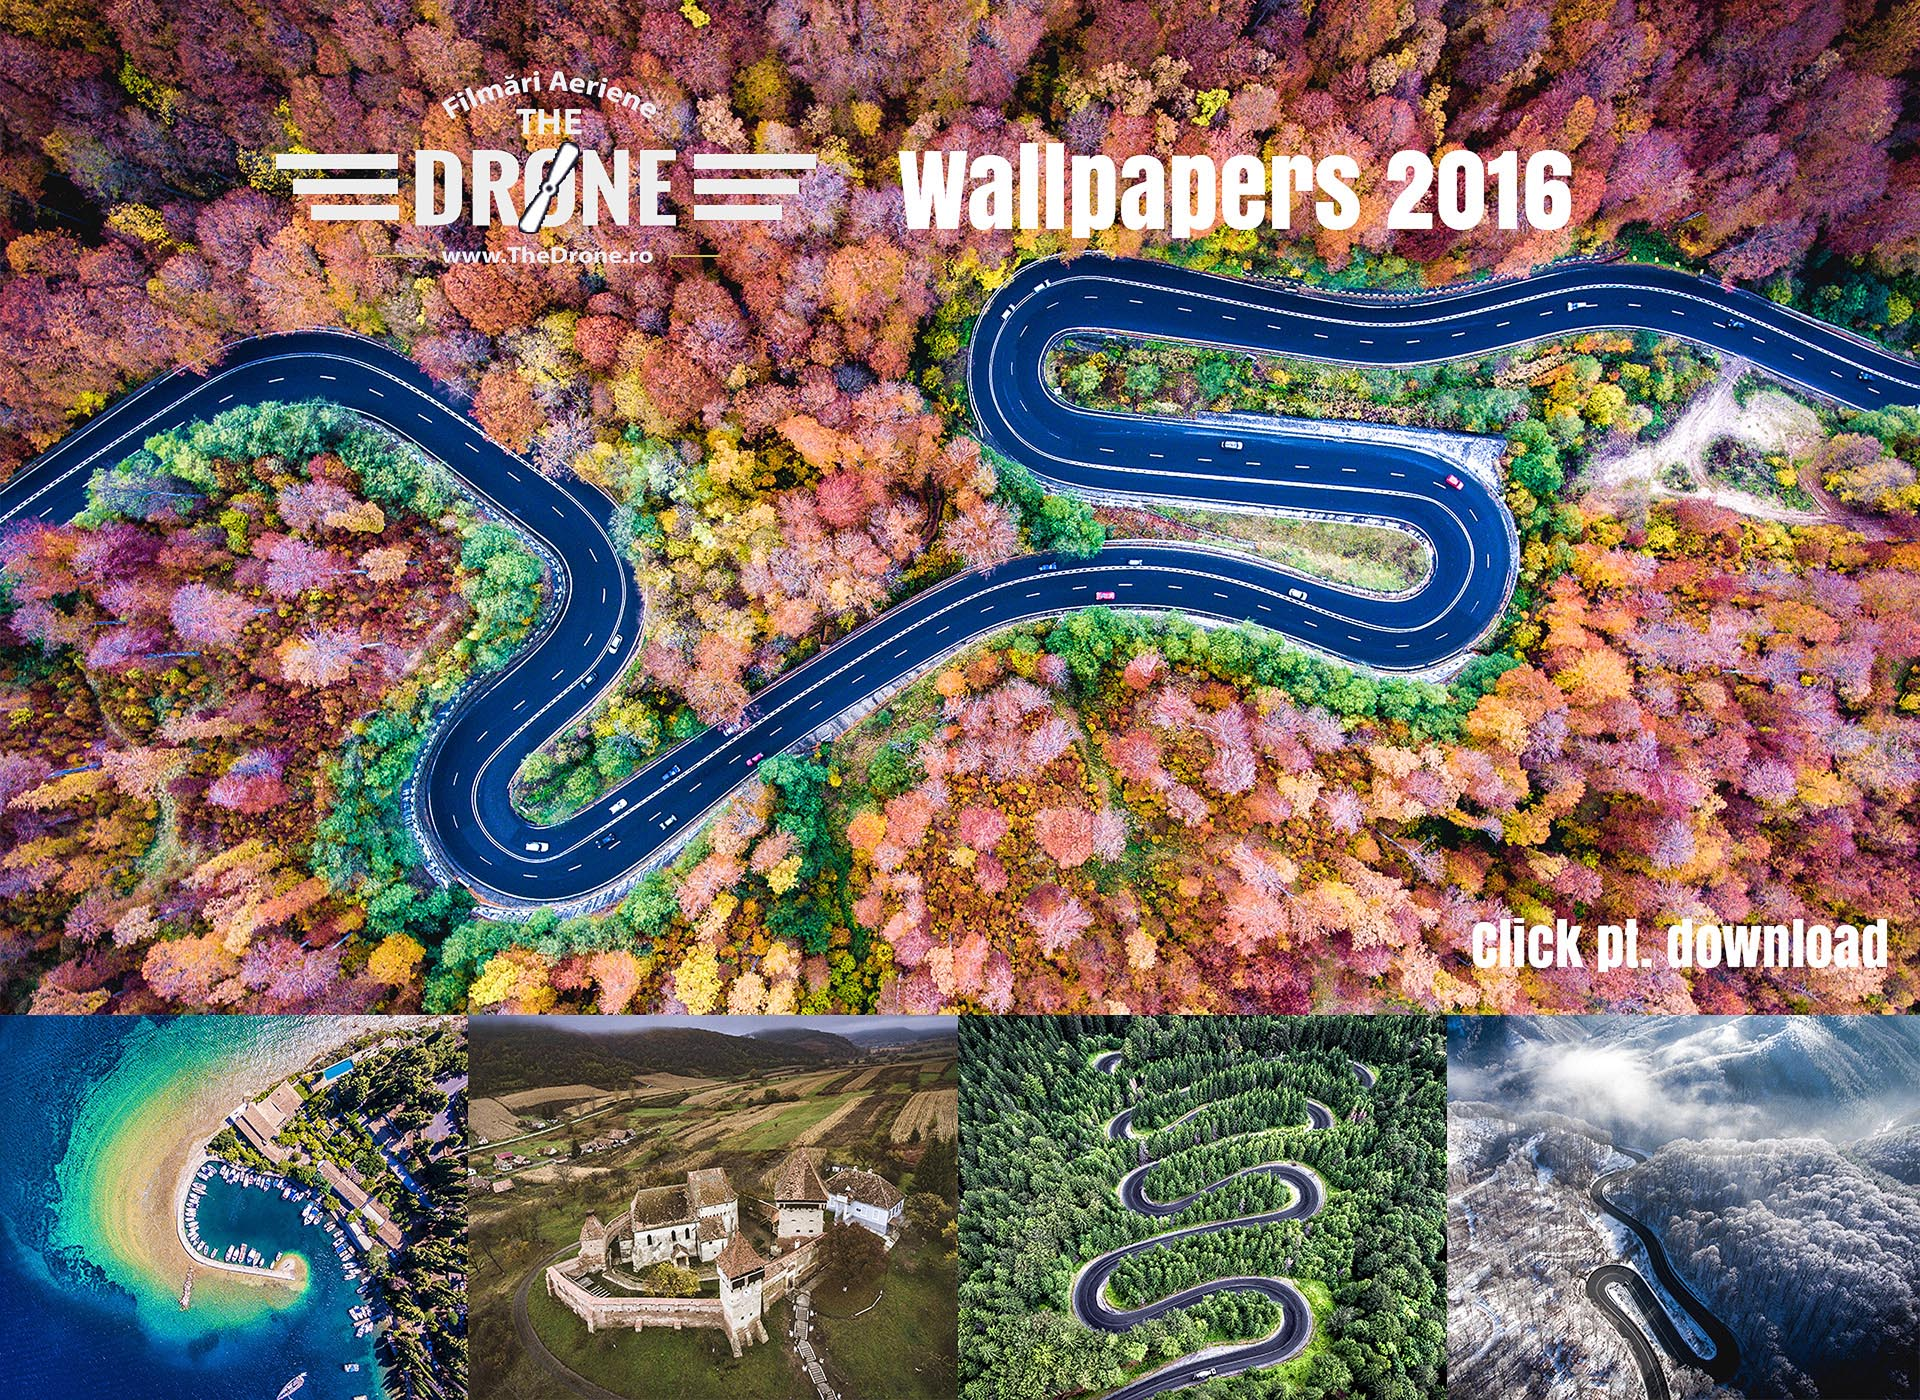 Colecția de walpapere TheDrone.ro 2016